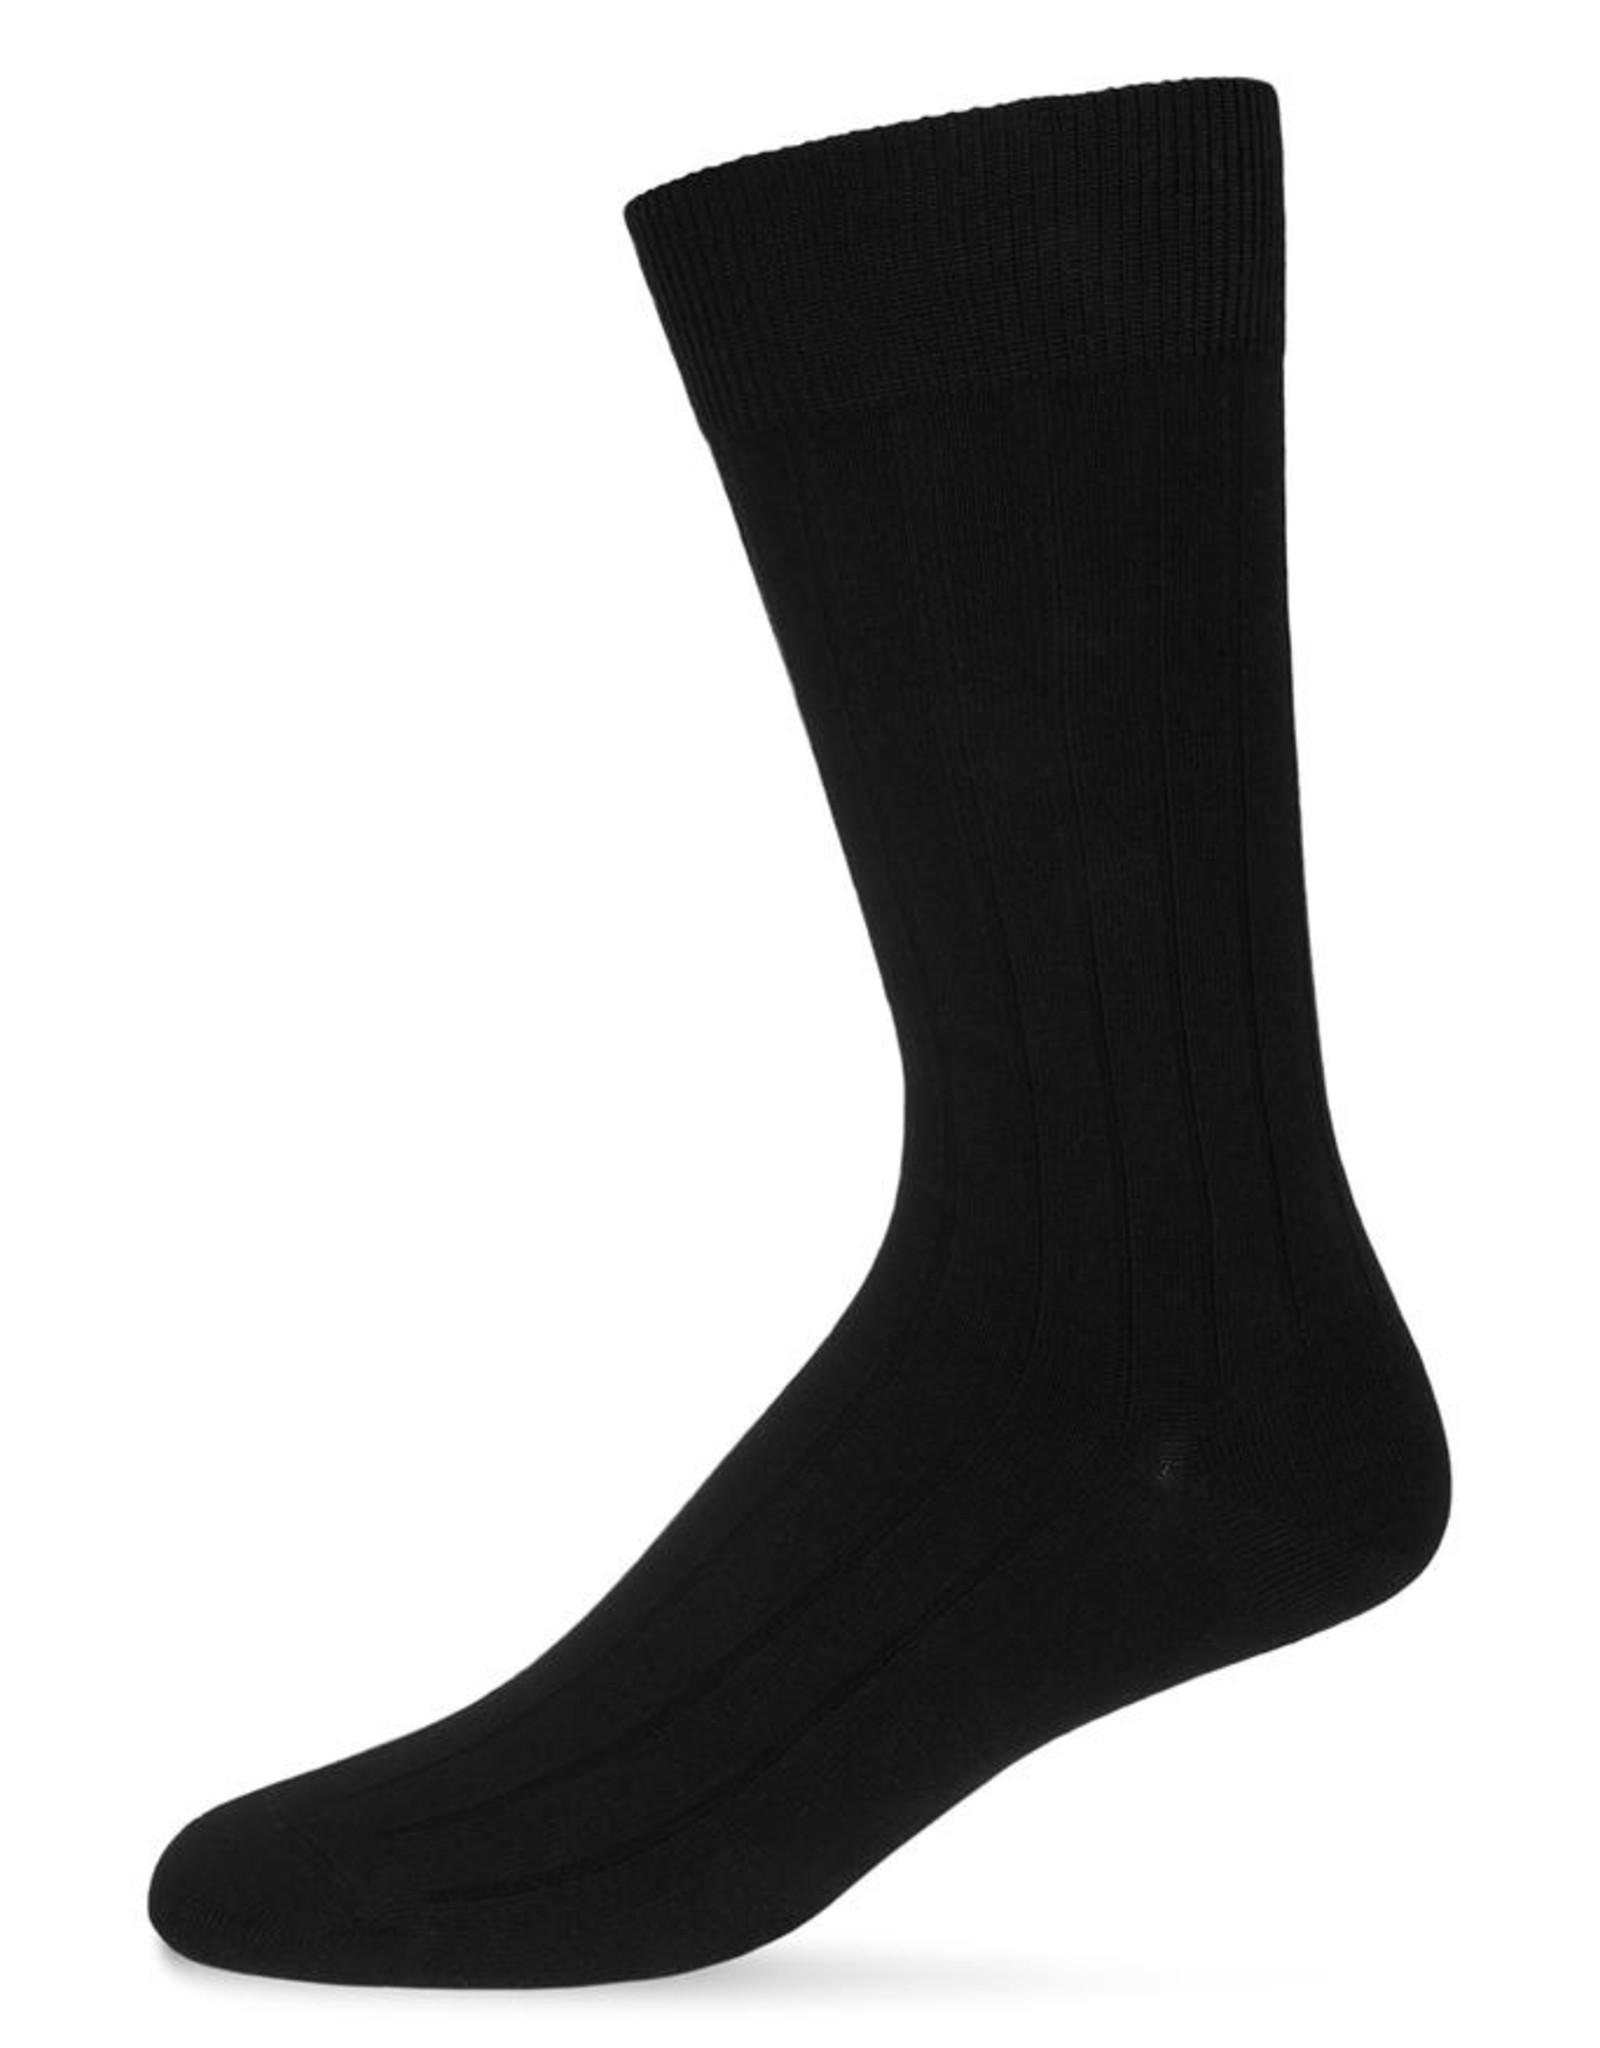 Memoi Memoi Mens Ribbed Extra Wear 3-Pack Socks